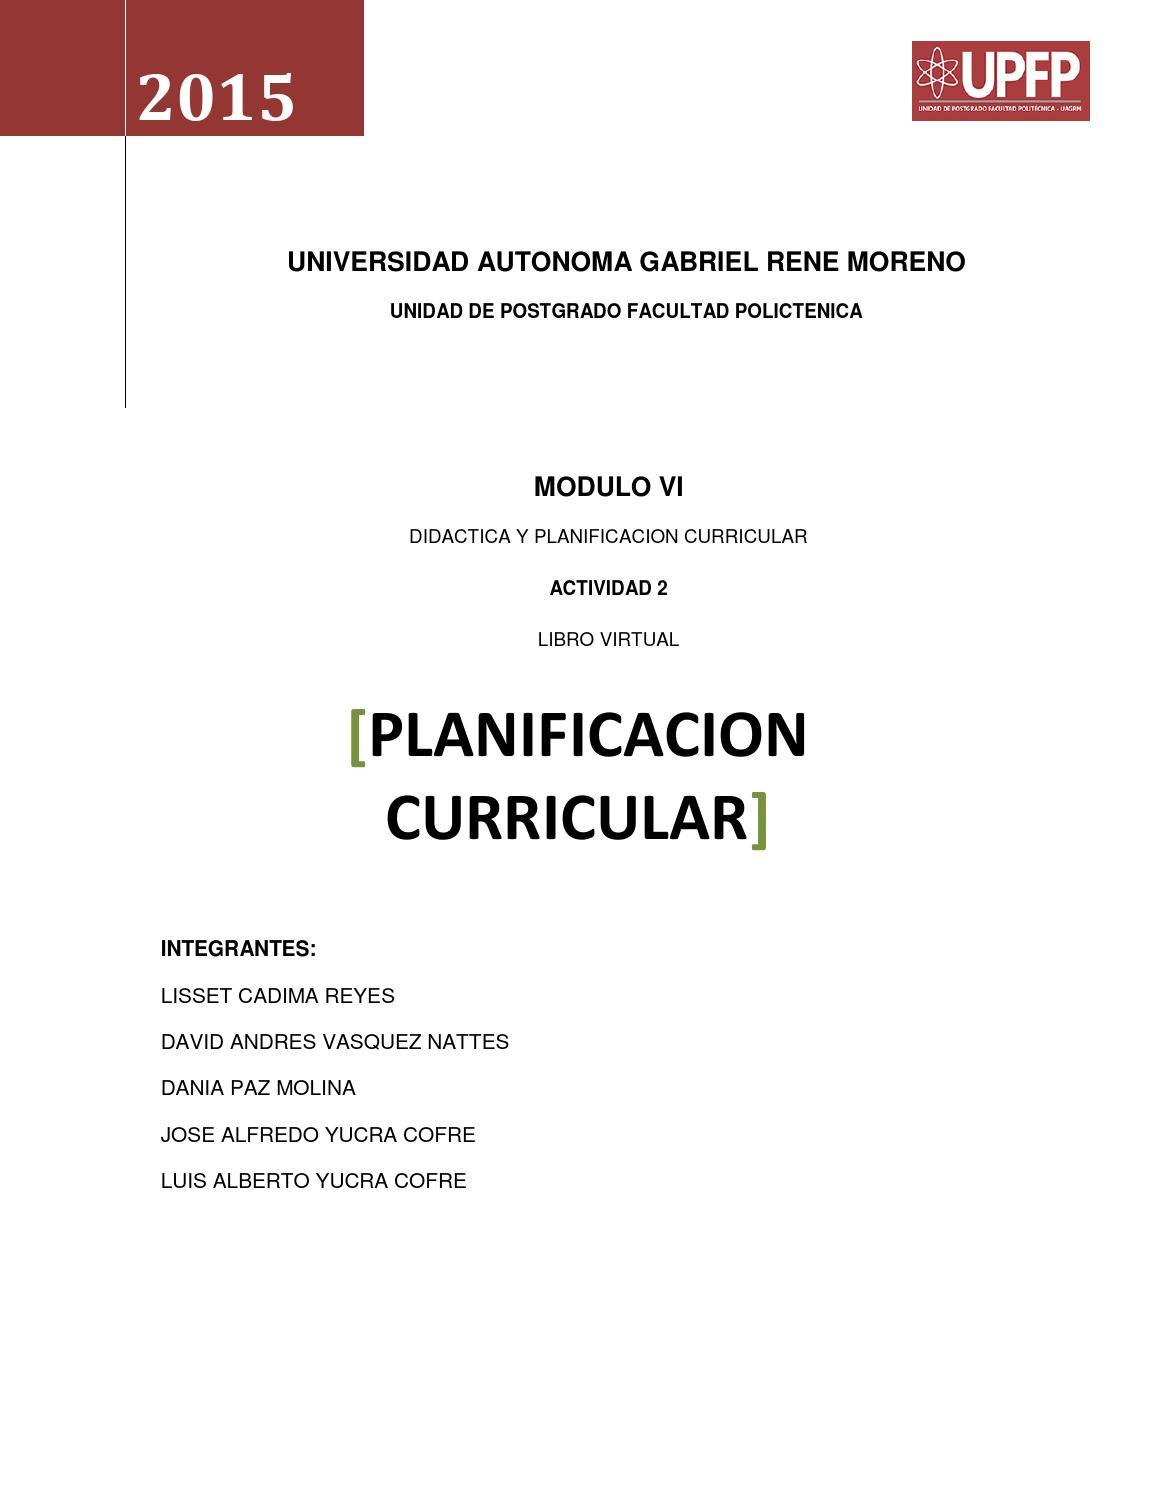 Planificacion curricular by Luis Alberto Yucra Cofré - issuu